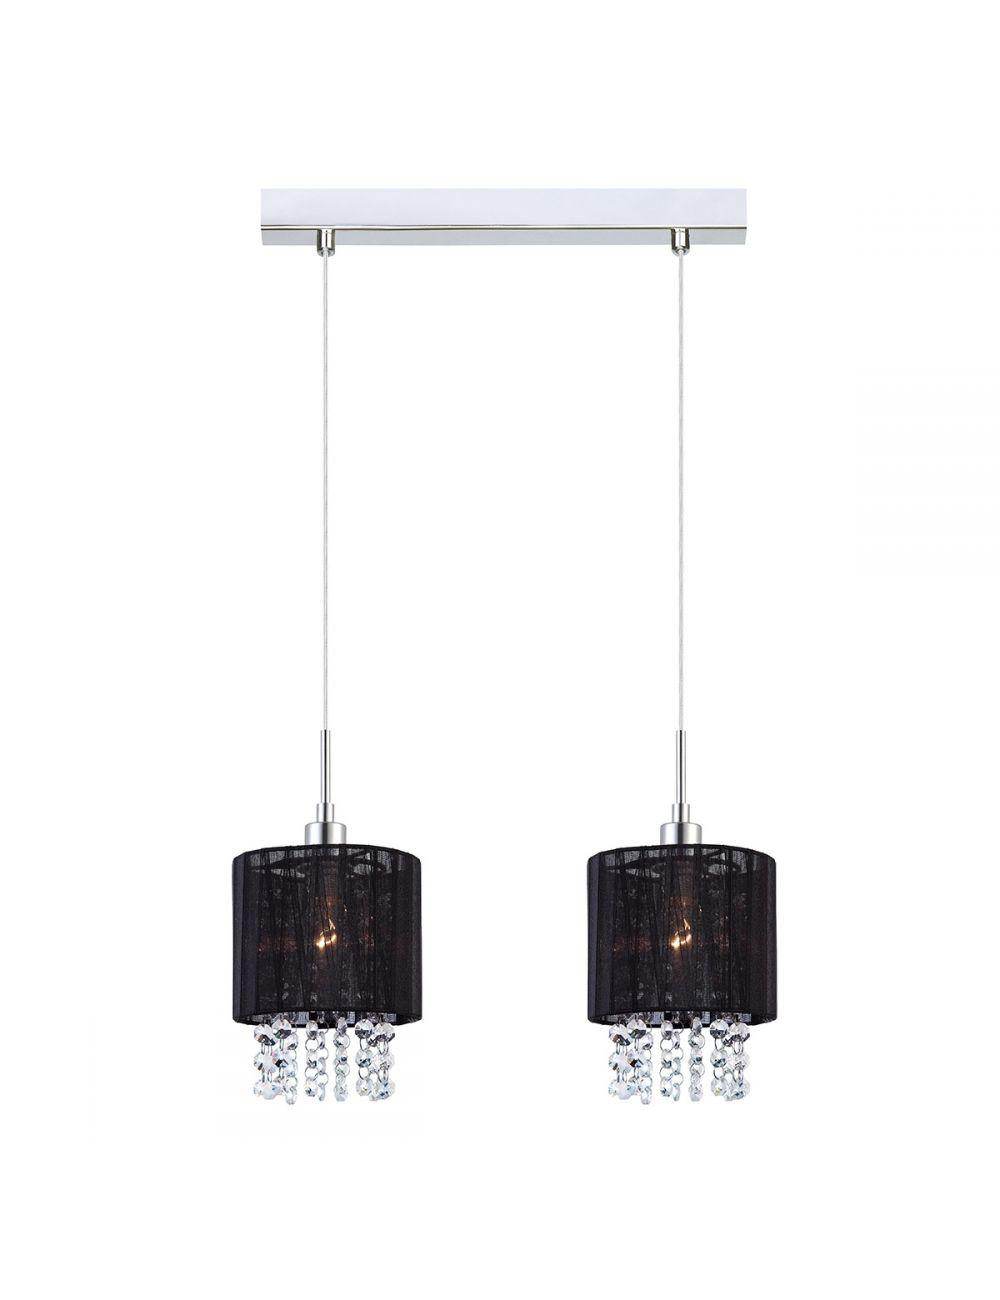 MDM1953-2 BK Astra lampa 2  czarna